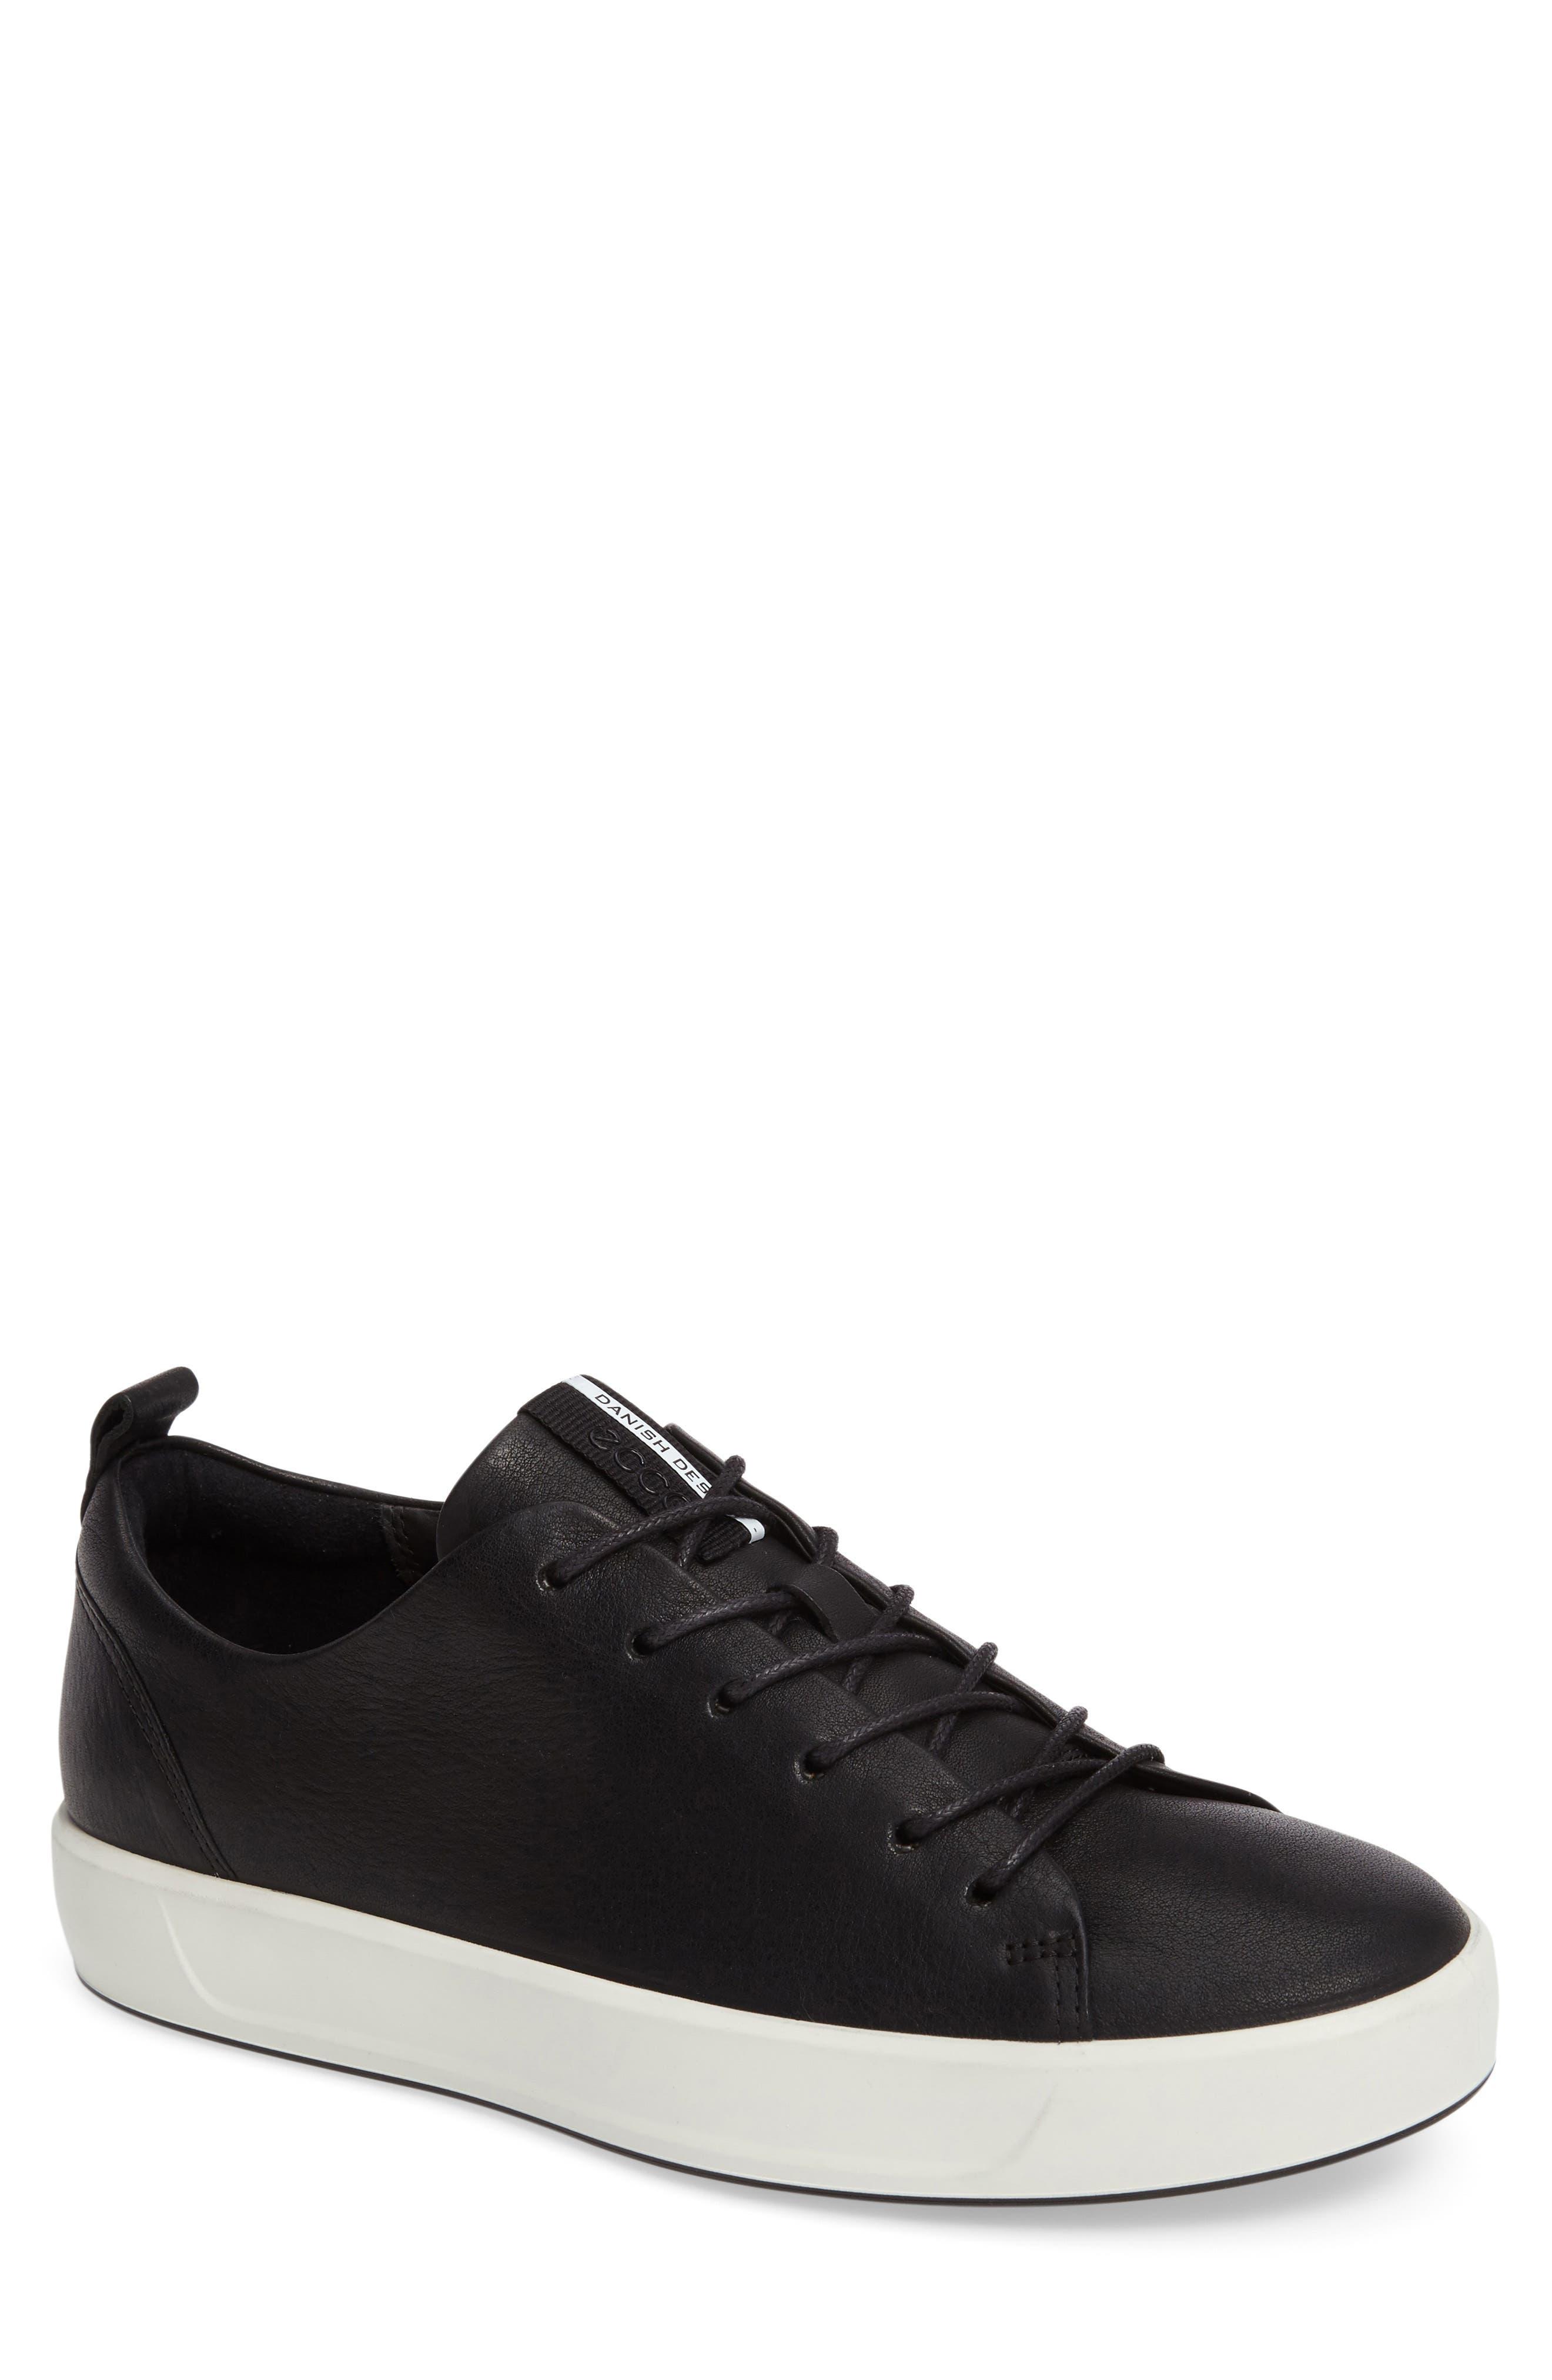 Soft 8 Sneaker,                             Main thumbnail 1, color,                             BLACK